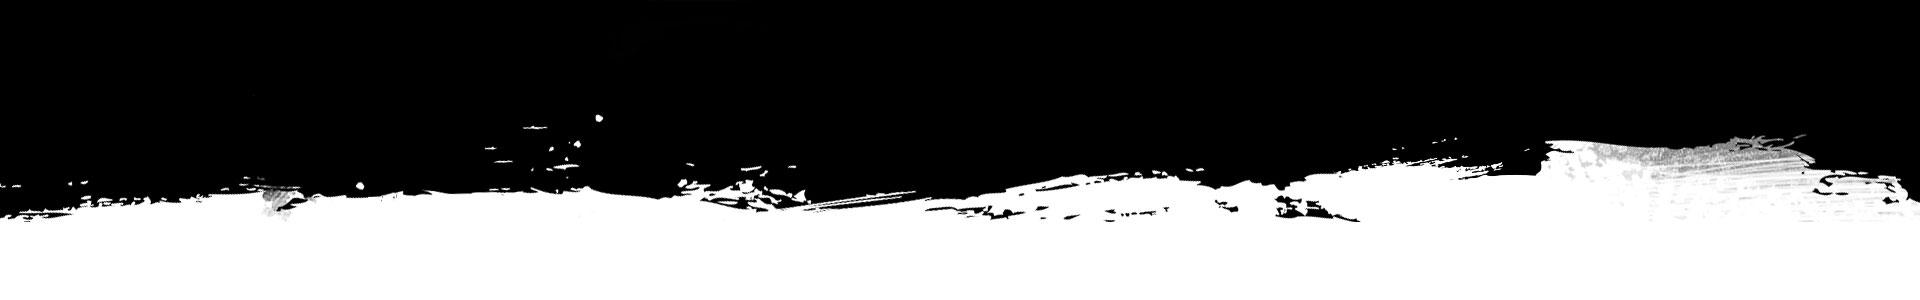 Snímek balení hry CrossfireX s černým pozadím a s bílými tahy barvy tahy na spodu